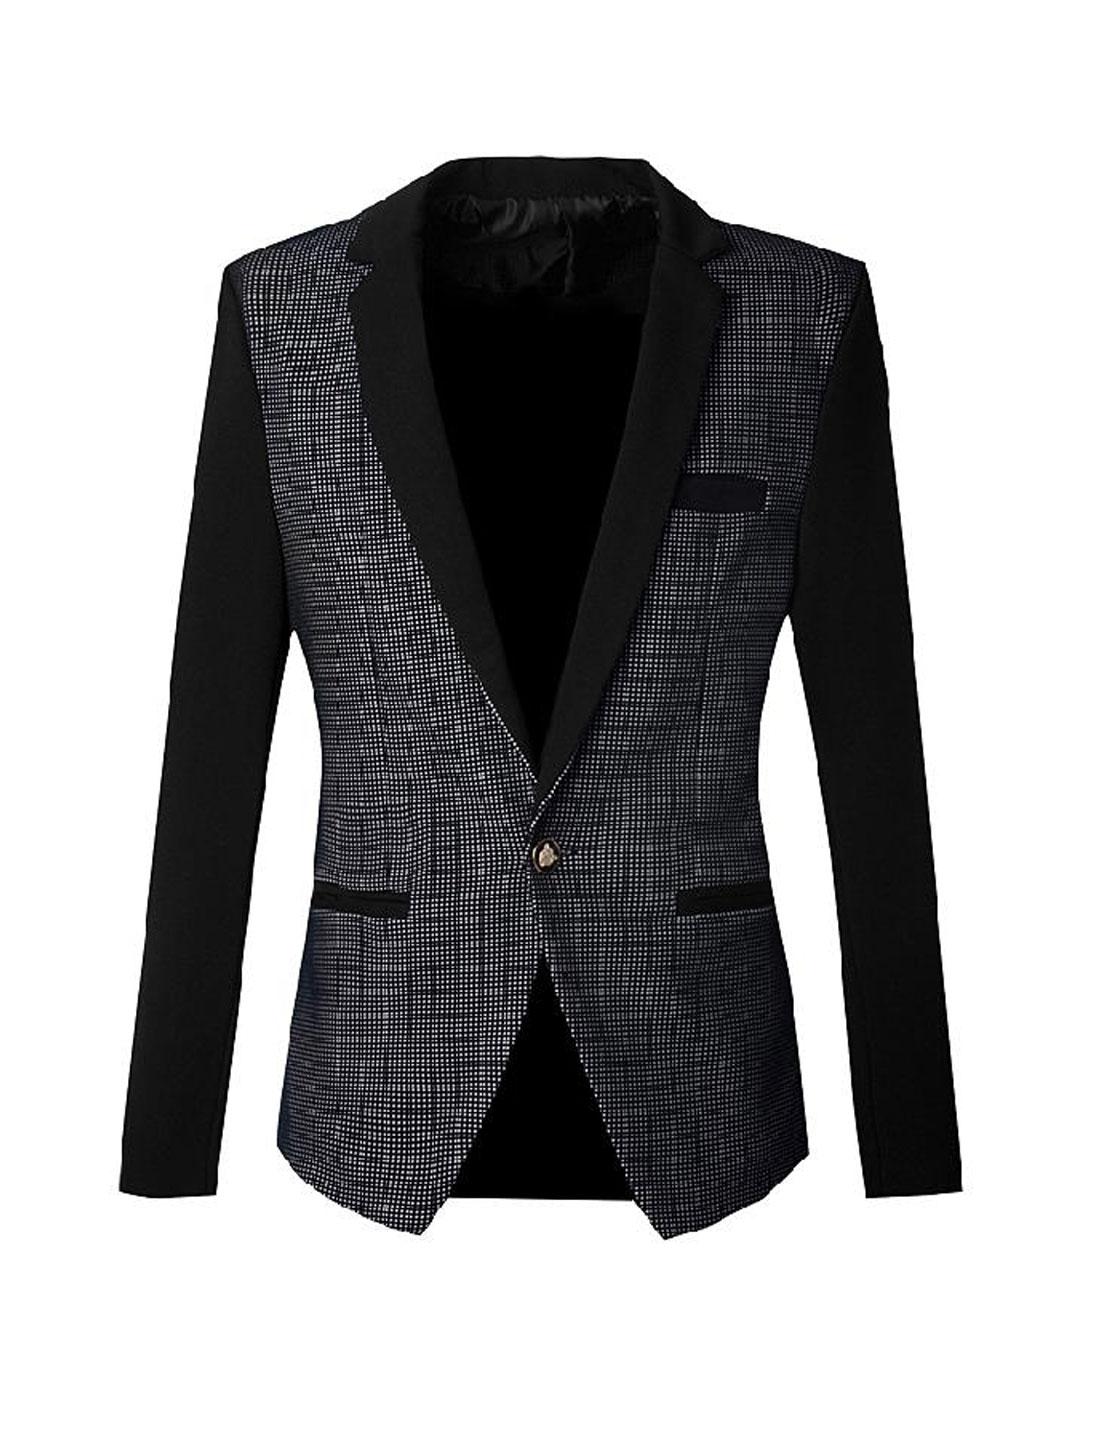 Cozy Fit Plaids Pattern Notched Lapel Blazer Jacket for Men Navy Blue Black S